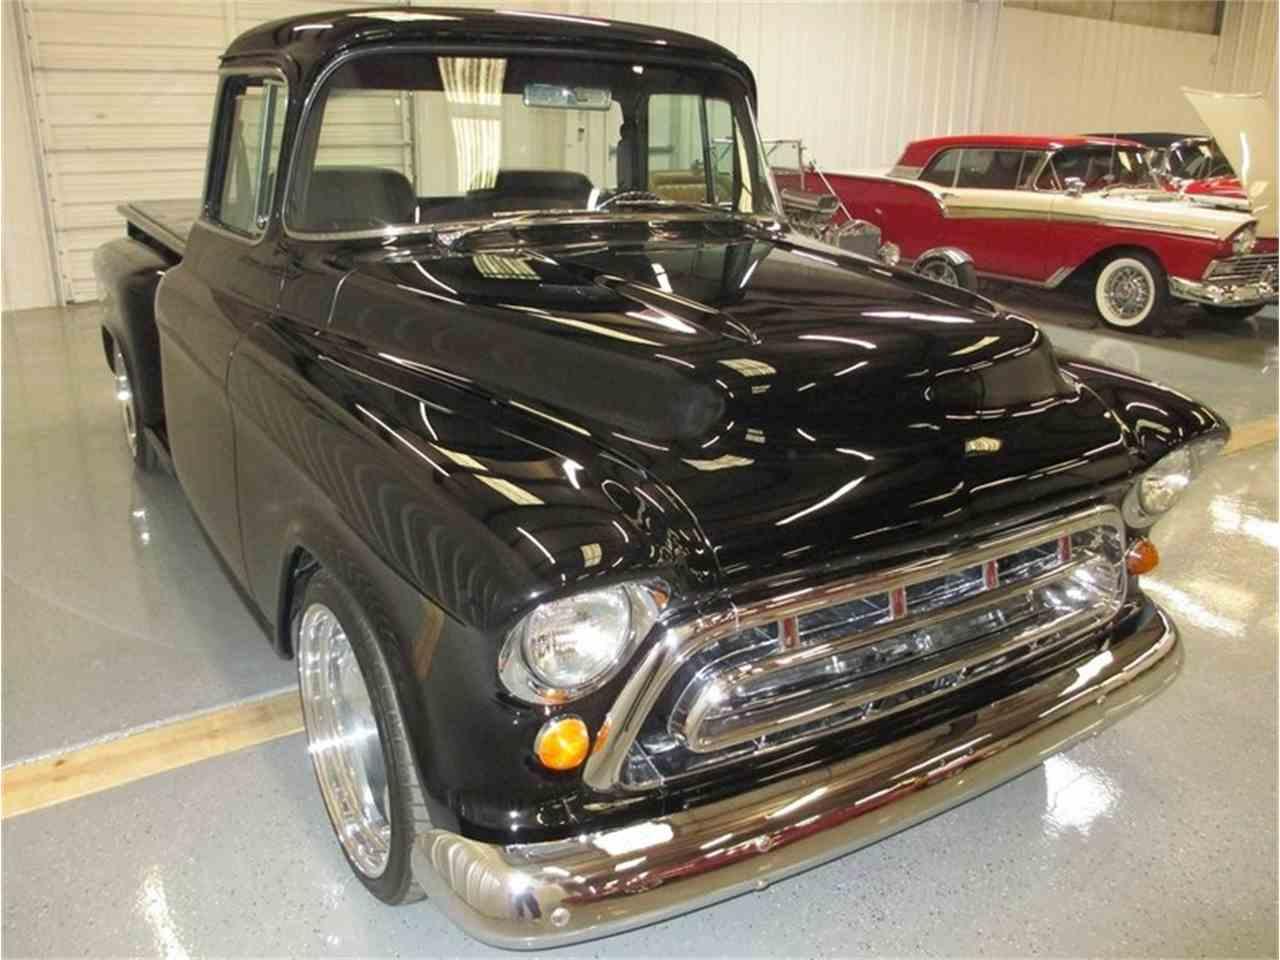 1957 Chevrolet Pickup for Sale | ClassicCars.com | CC-1089892